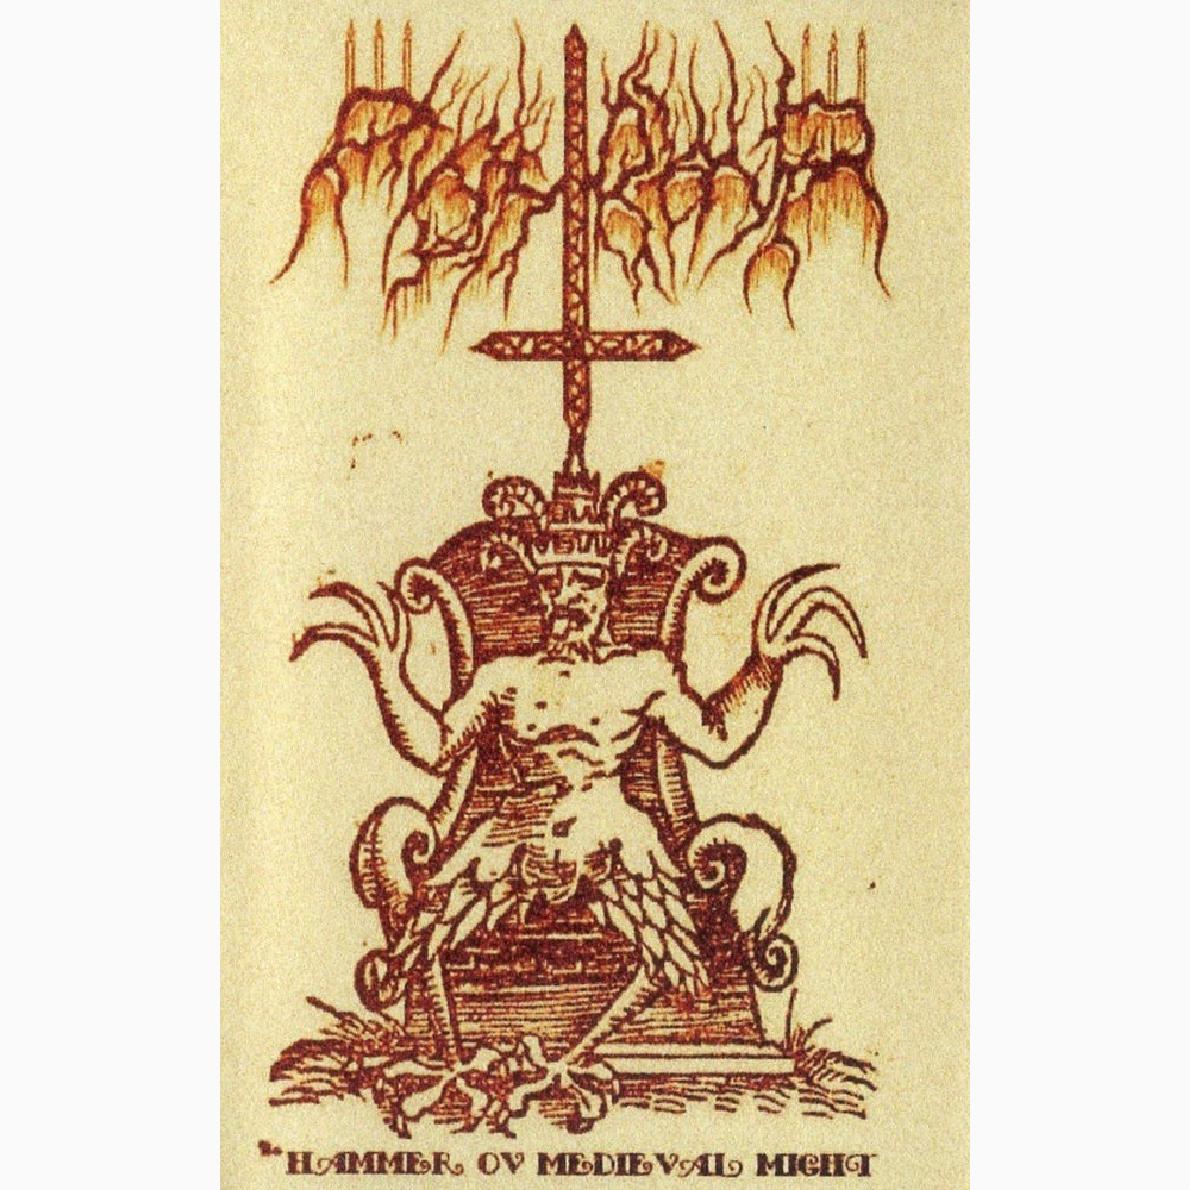 NIGHTBLOOD - Hammer Ov Medieval Might